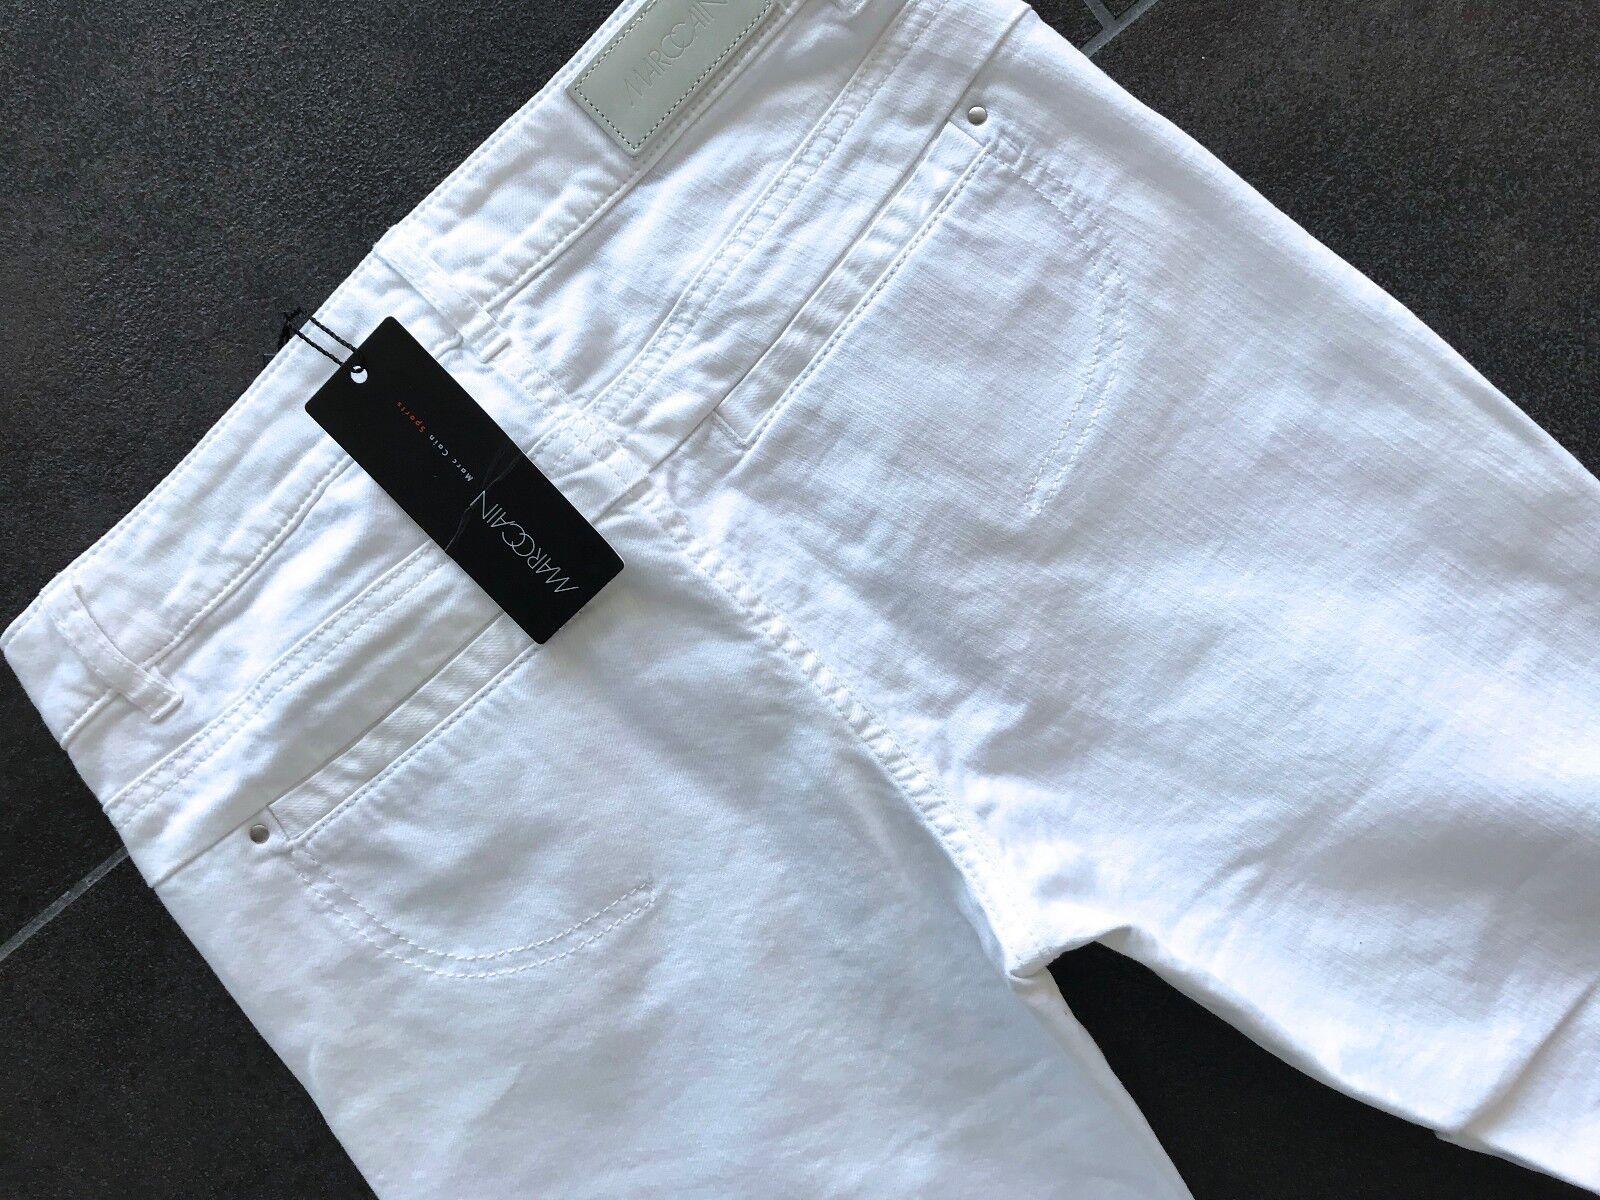 MARCCAIN Pantaloni Jeans Skinny Top Ankle stivali lunghezza tg. tg. tg. 36 2 d1fb3a